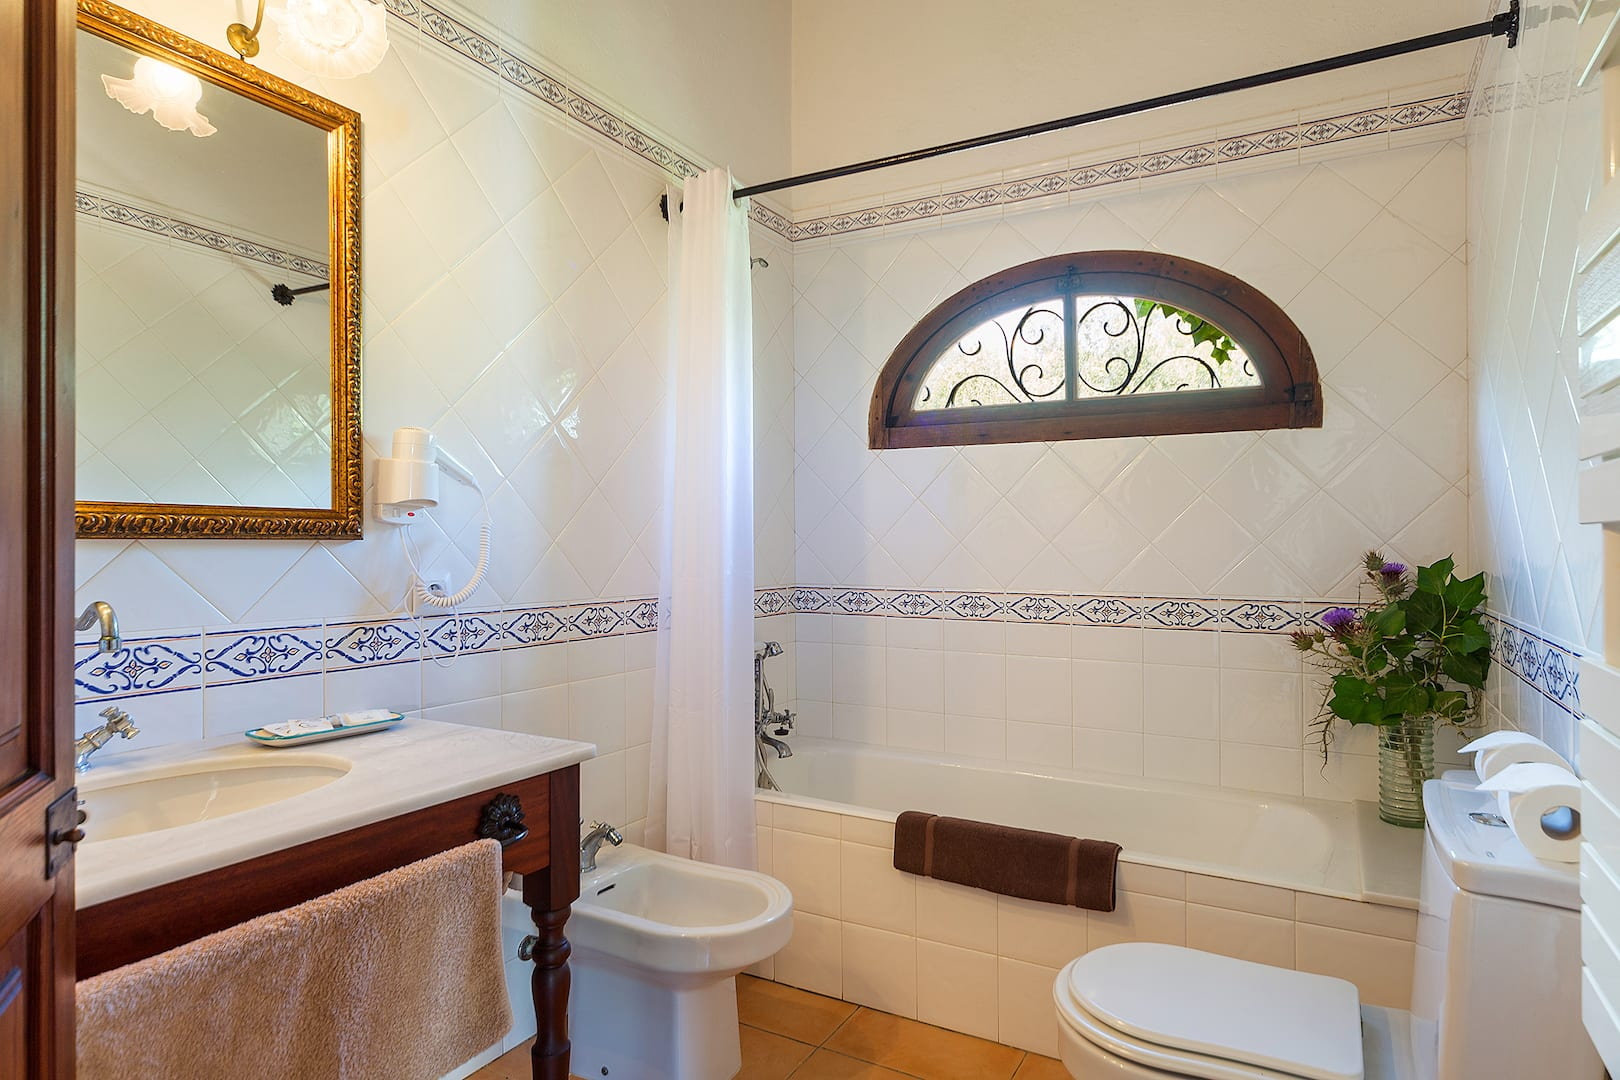 ISLA Finca Hotel Can Gaia Badezimmer mit Badewanne